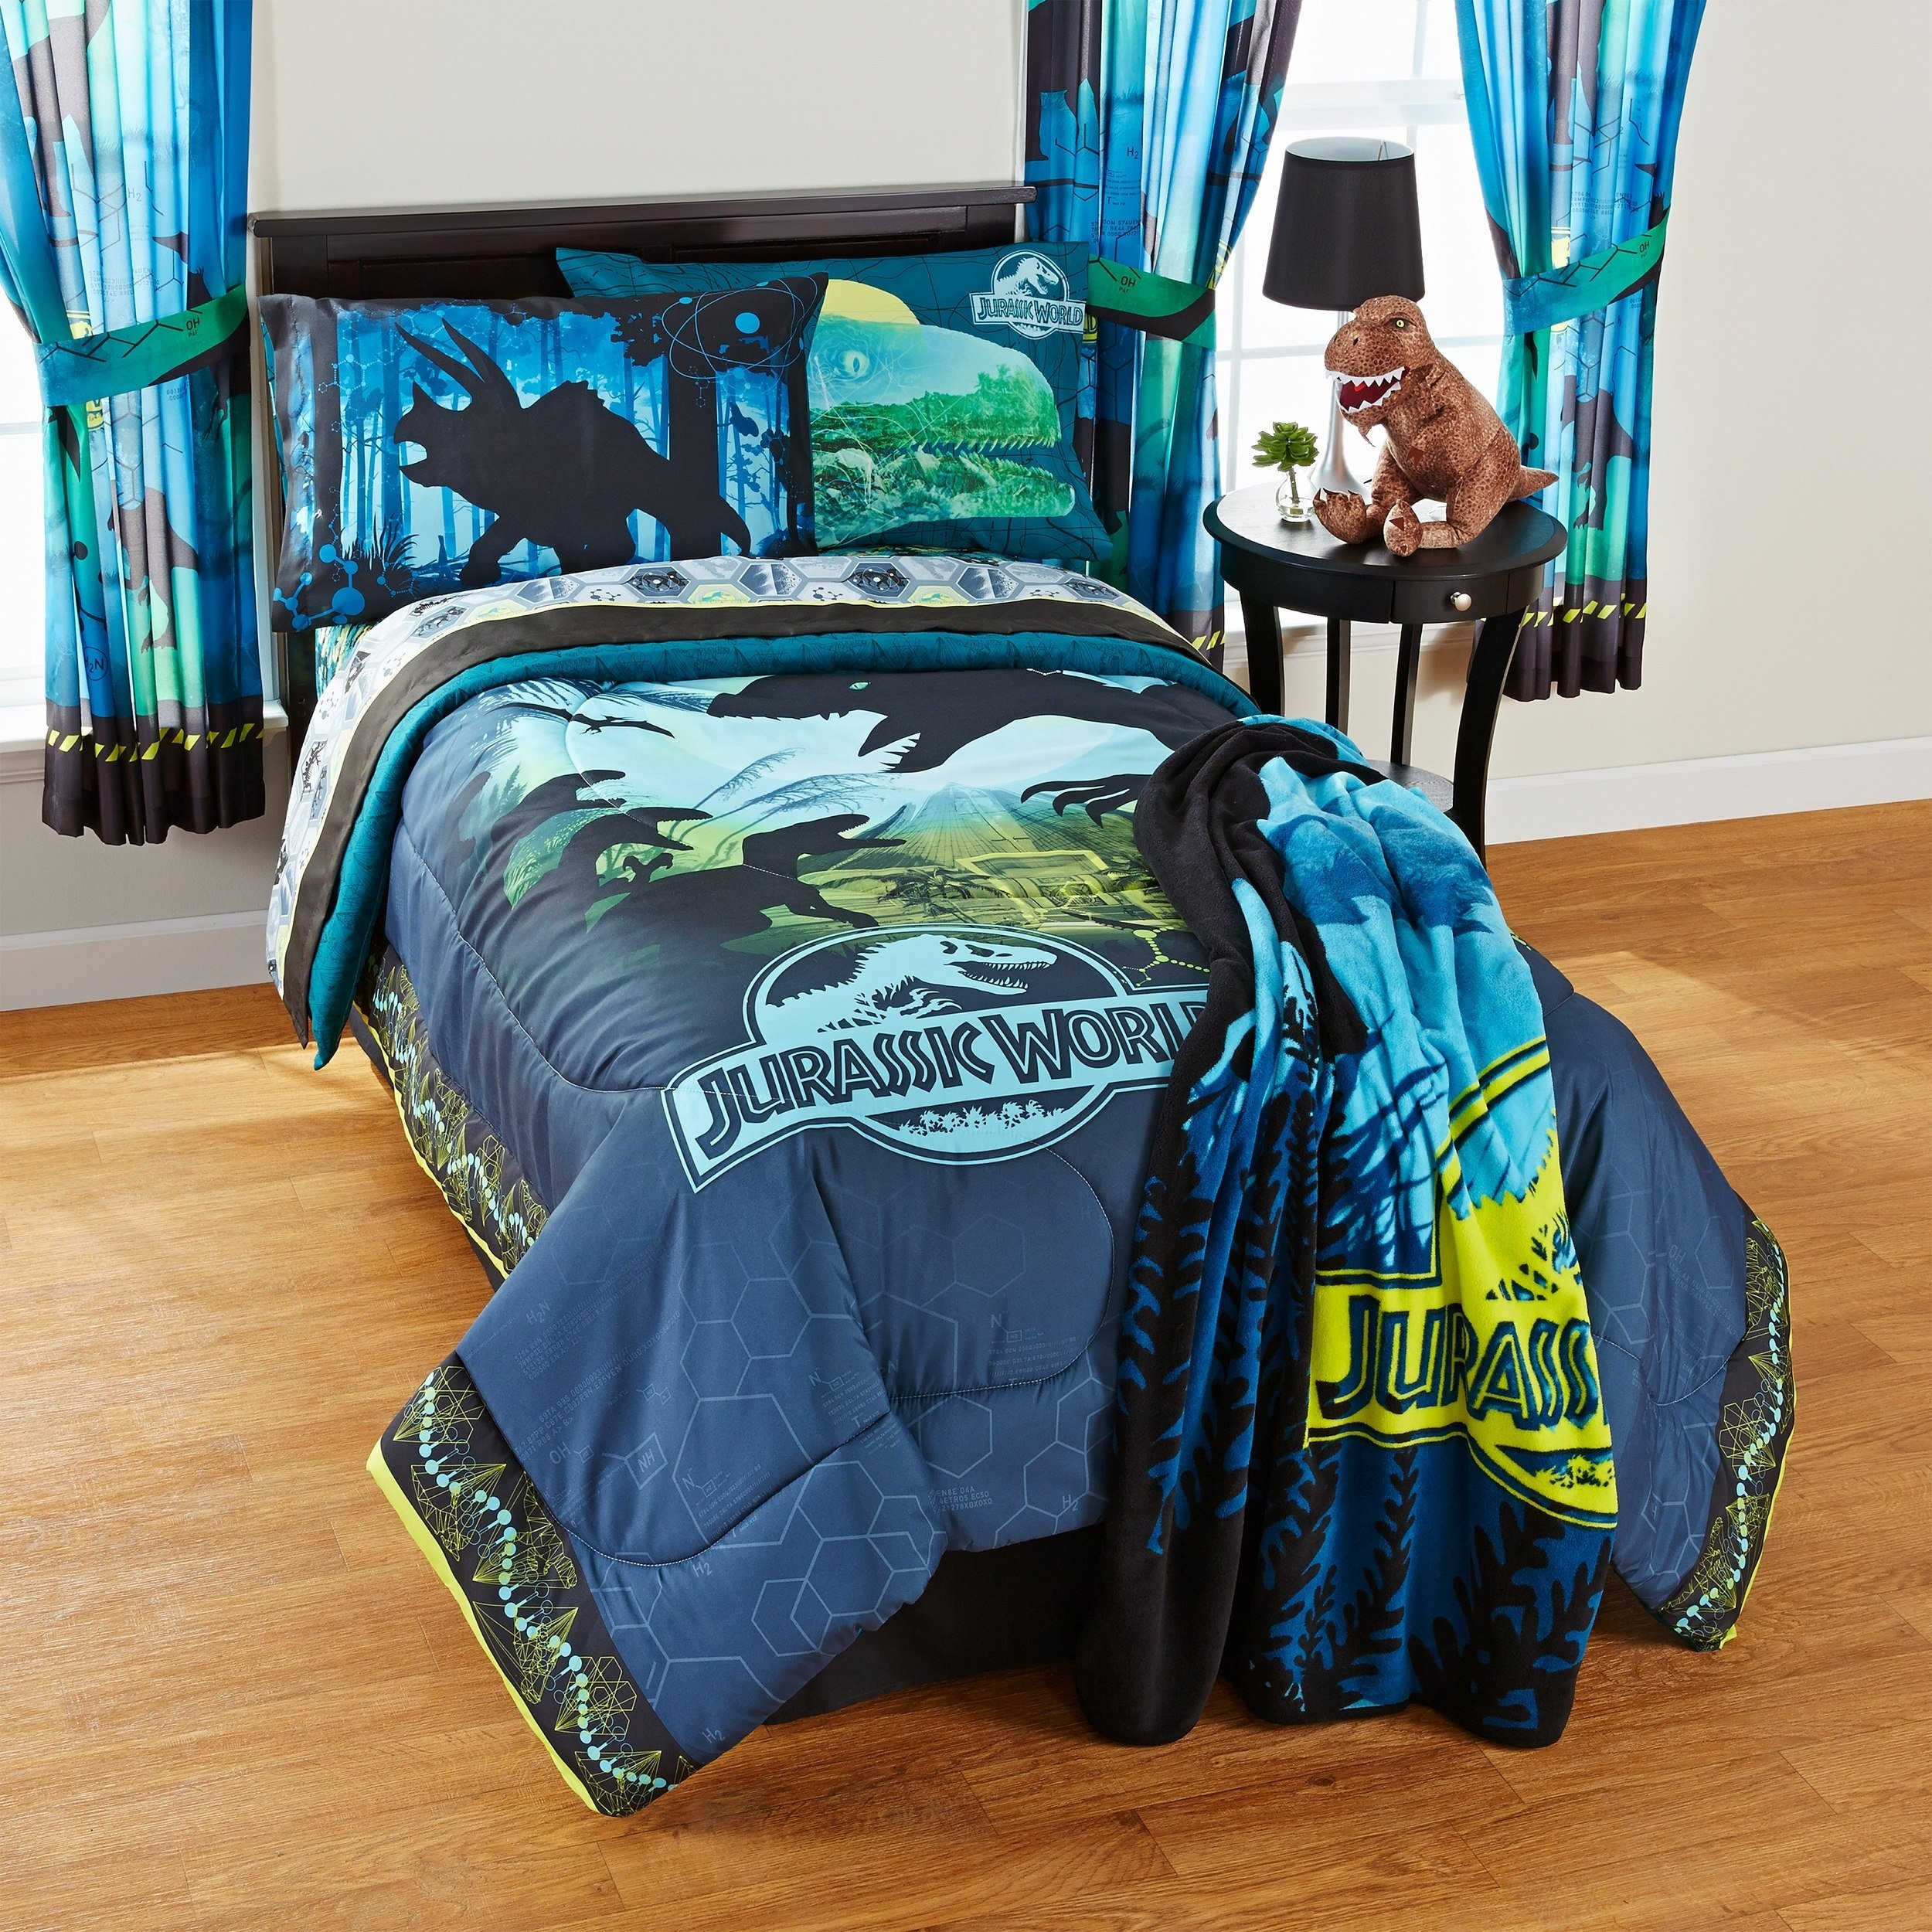 5 Piece Jurassic World Themed Comforter Set Full, Blue Black Yellow Grey Magical Movie Cartoon Character Adventurous Teen Themed Reversible Kids Bedding For Bedroom Casual, Microfiber